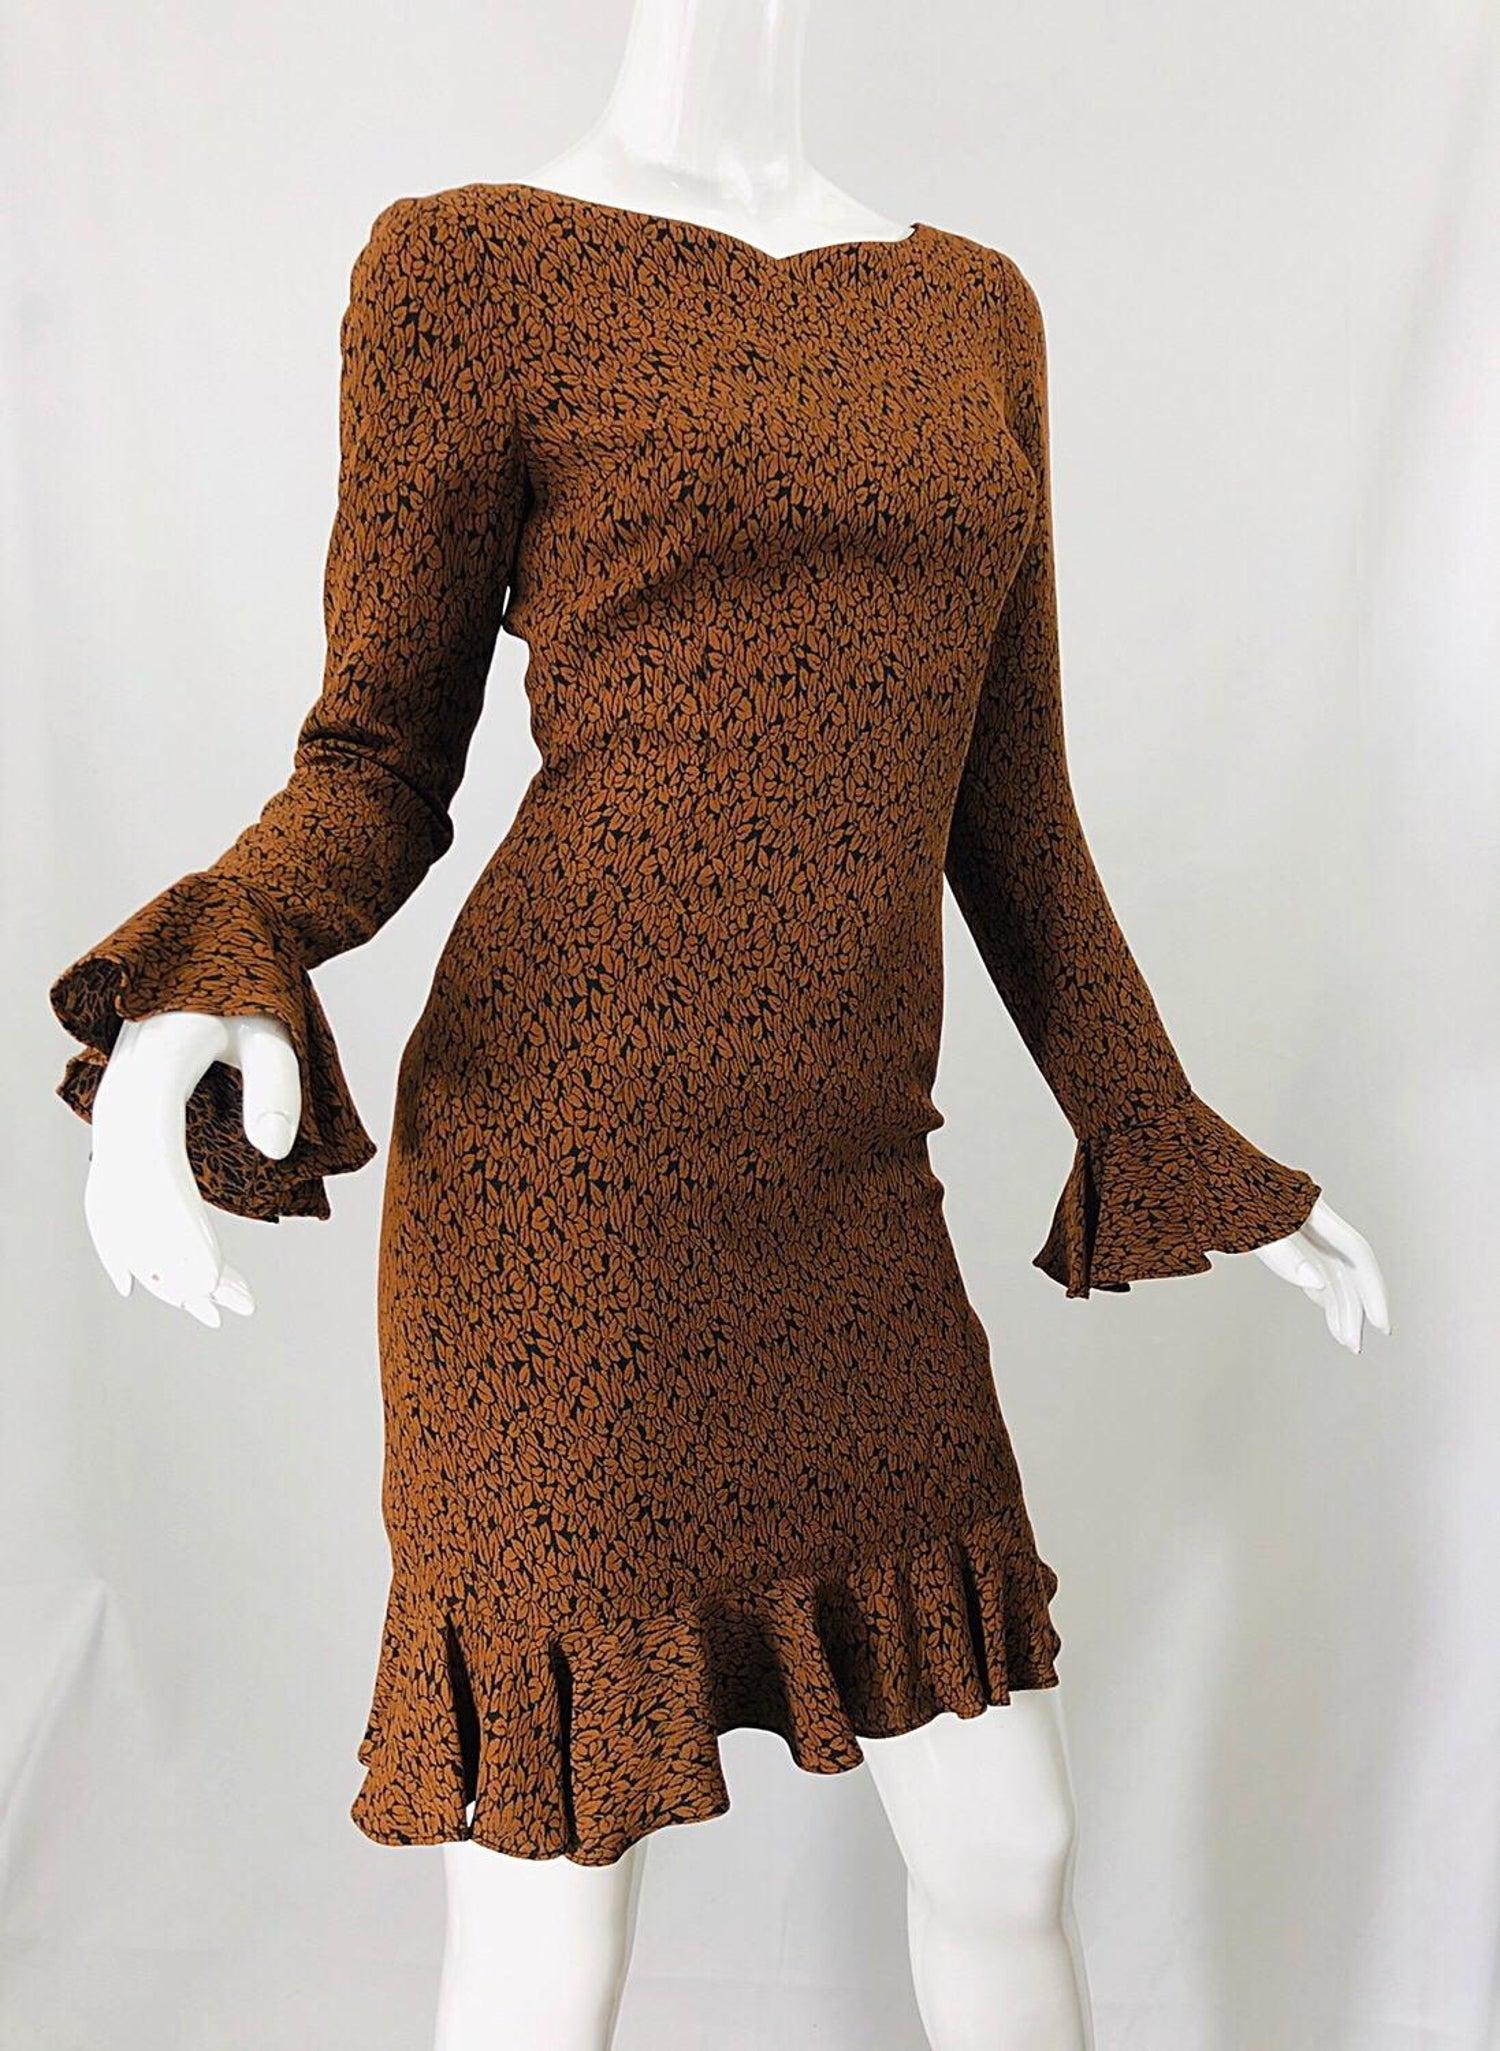 1b469e1750e5d 1990s Nicole Miller Leaf Print Brown Size 4 Bell Sleeve Vintage 90s Dress  For Sale at 1stdibs